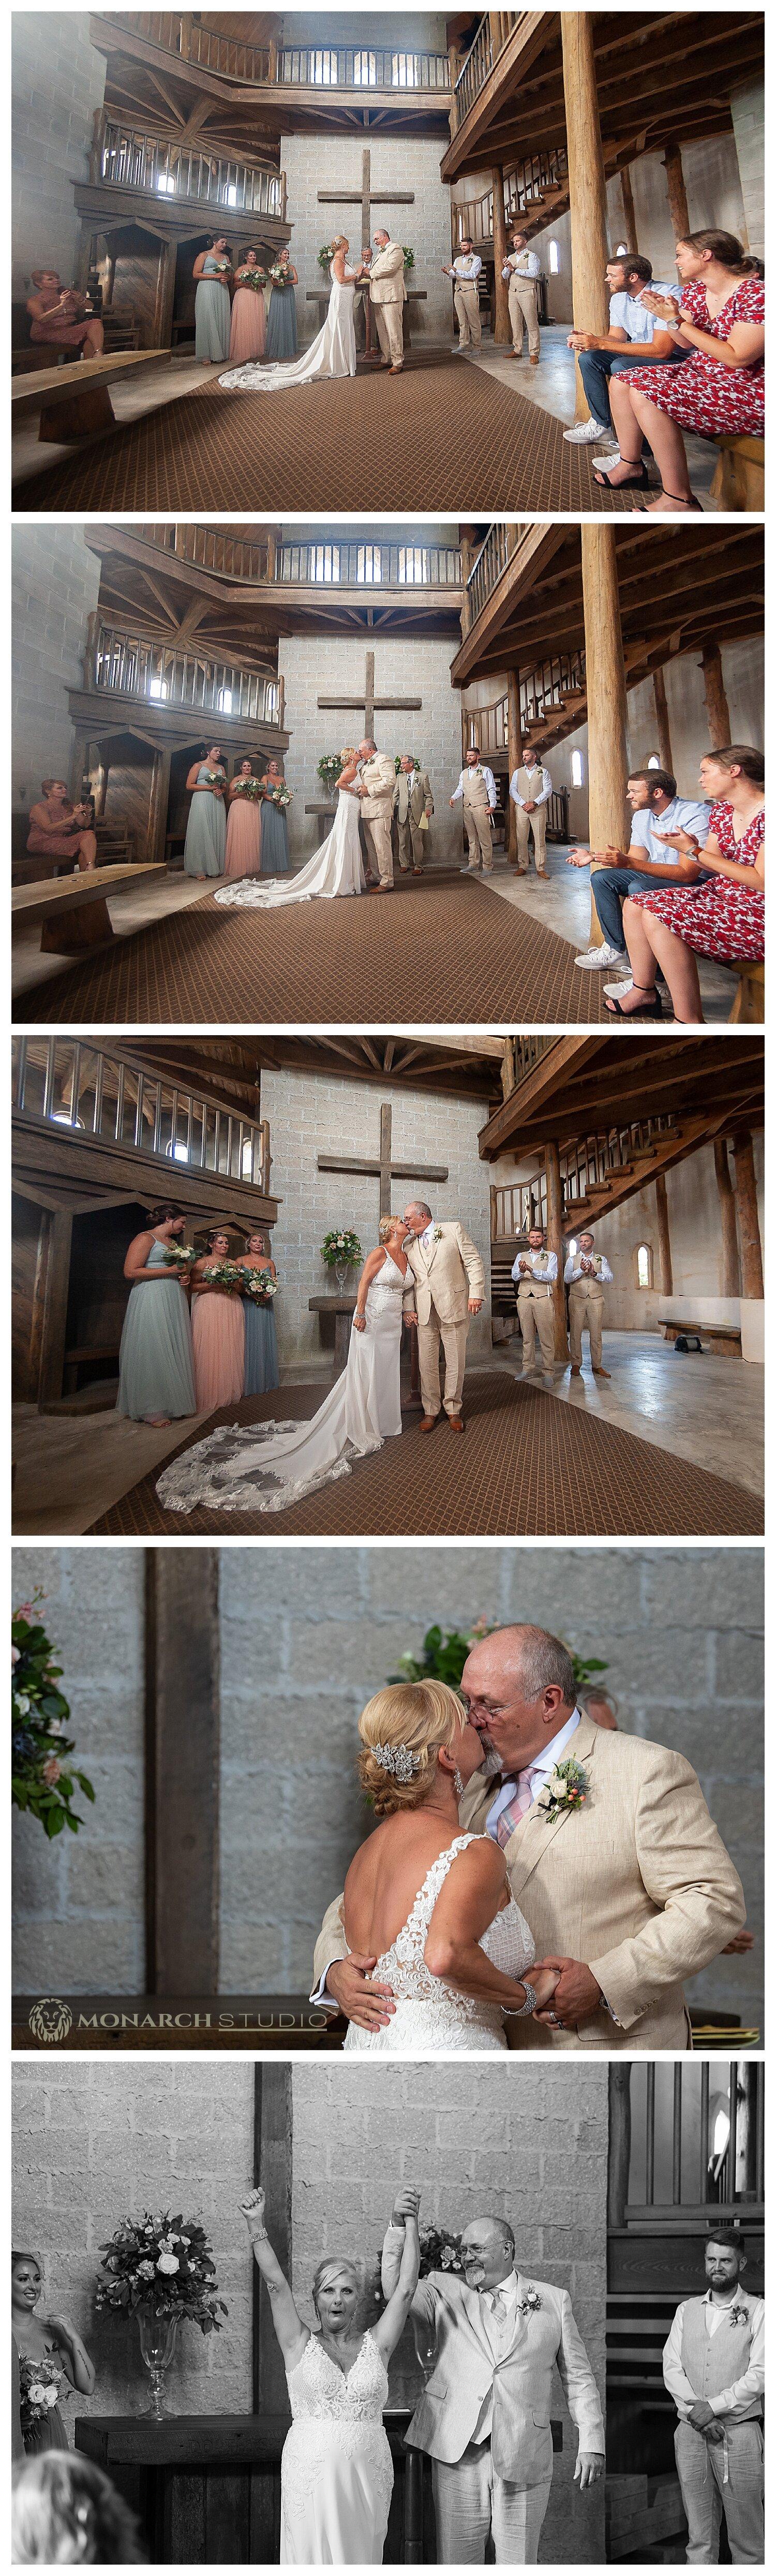 Florida Castle Wedding - St. Augustine 019.JPG